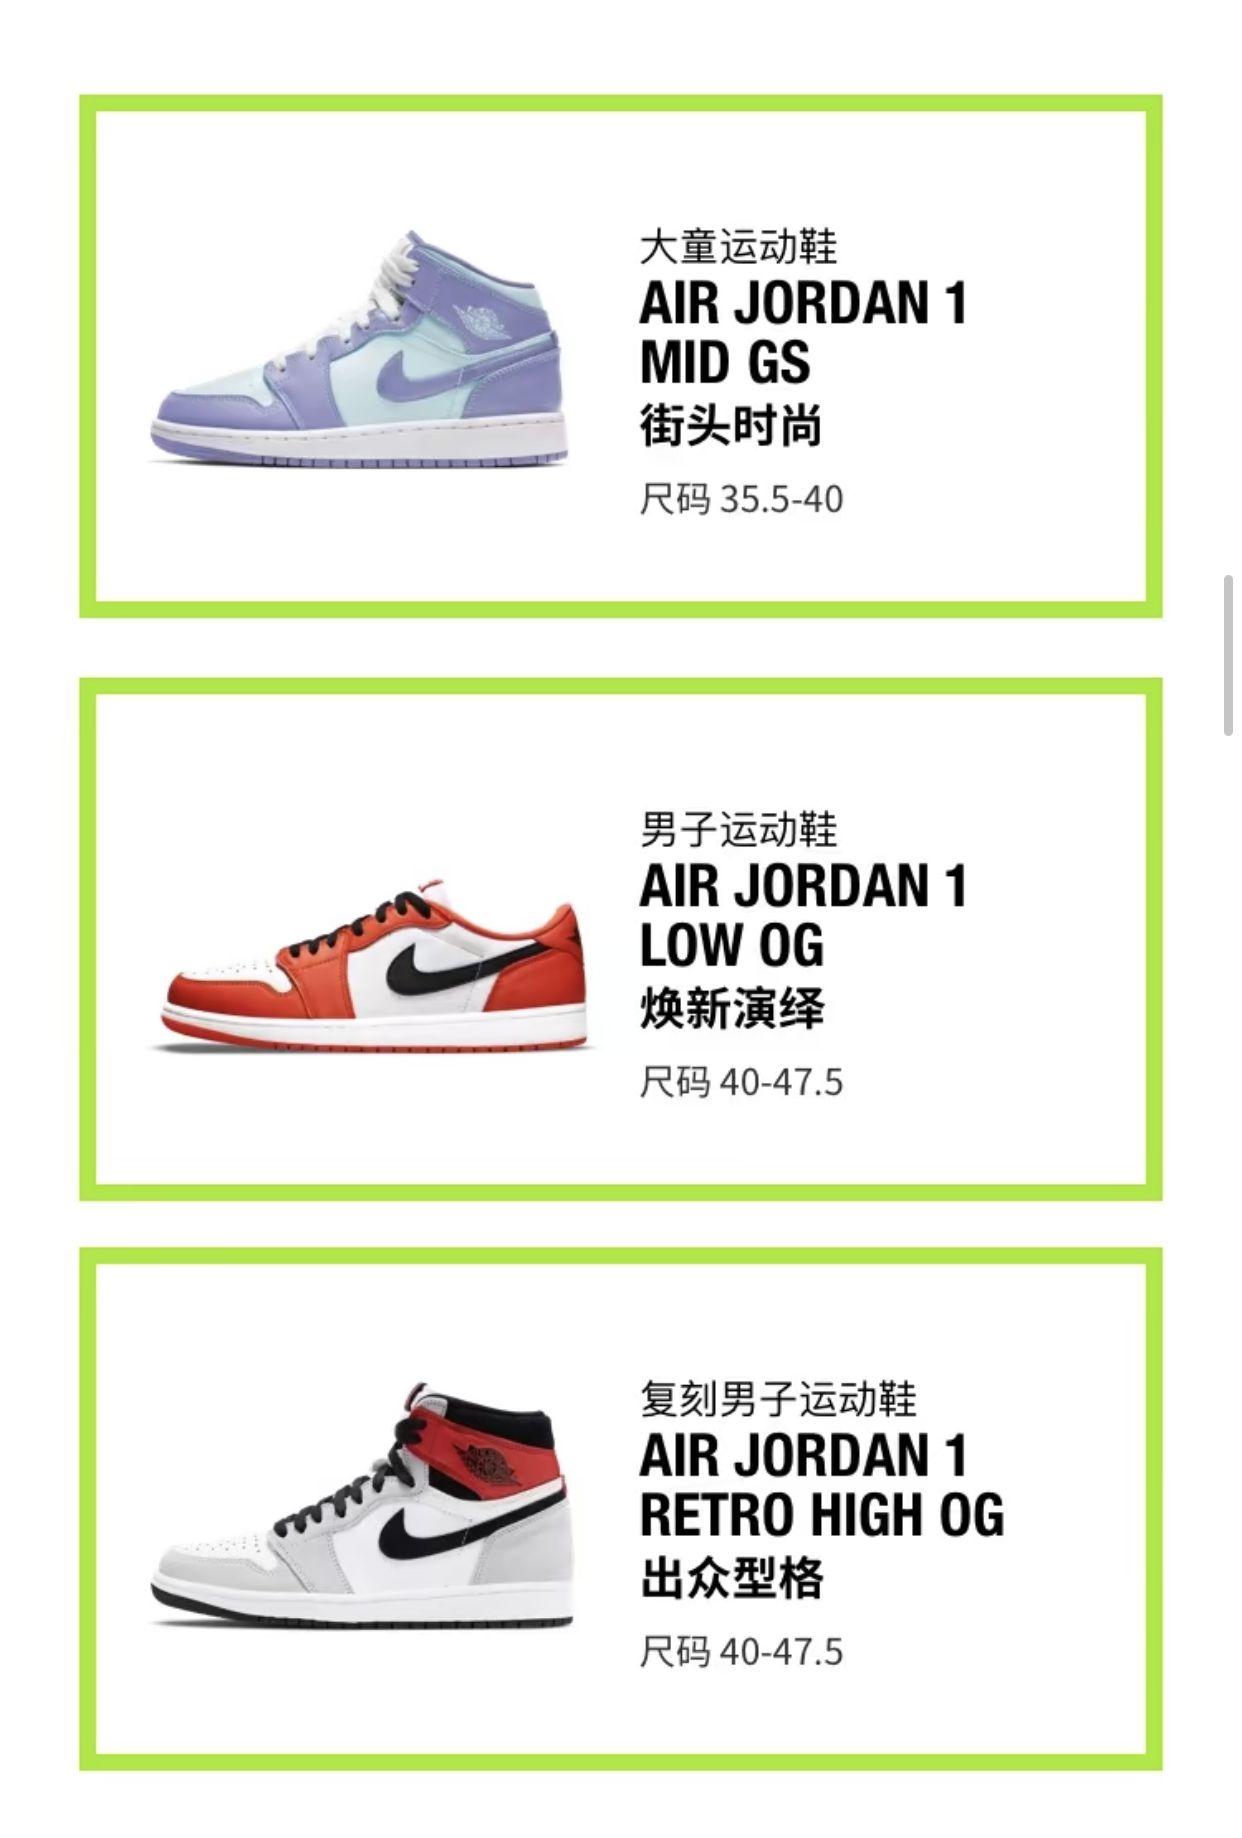 Nike,AirJordan,Dunk,Stussy,AP  Nike APP 今晚开启!Air Jordan、Dunk 全都有!十几双狠鞋轮番登场!